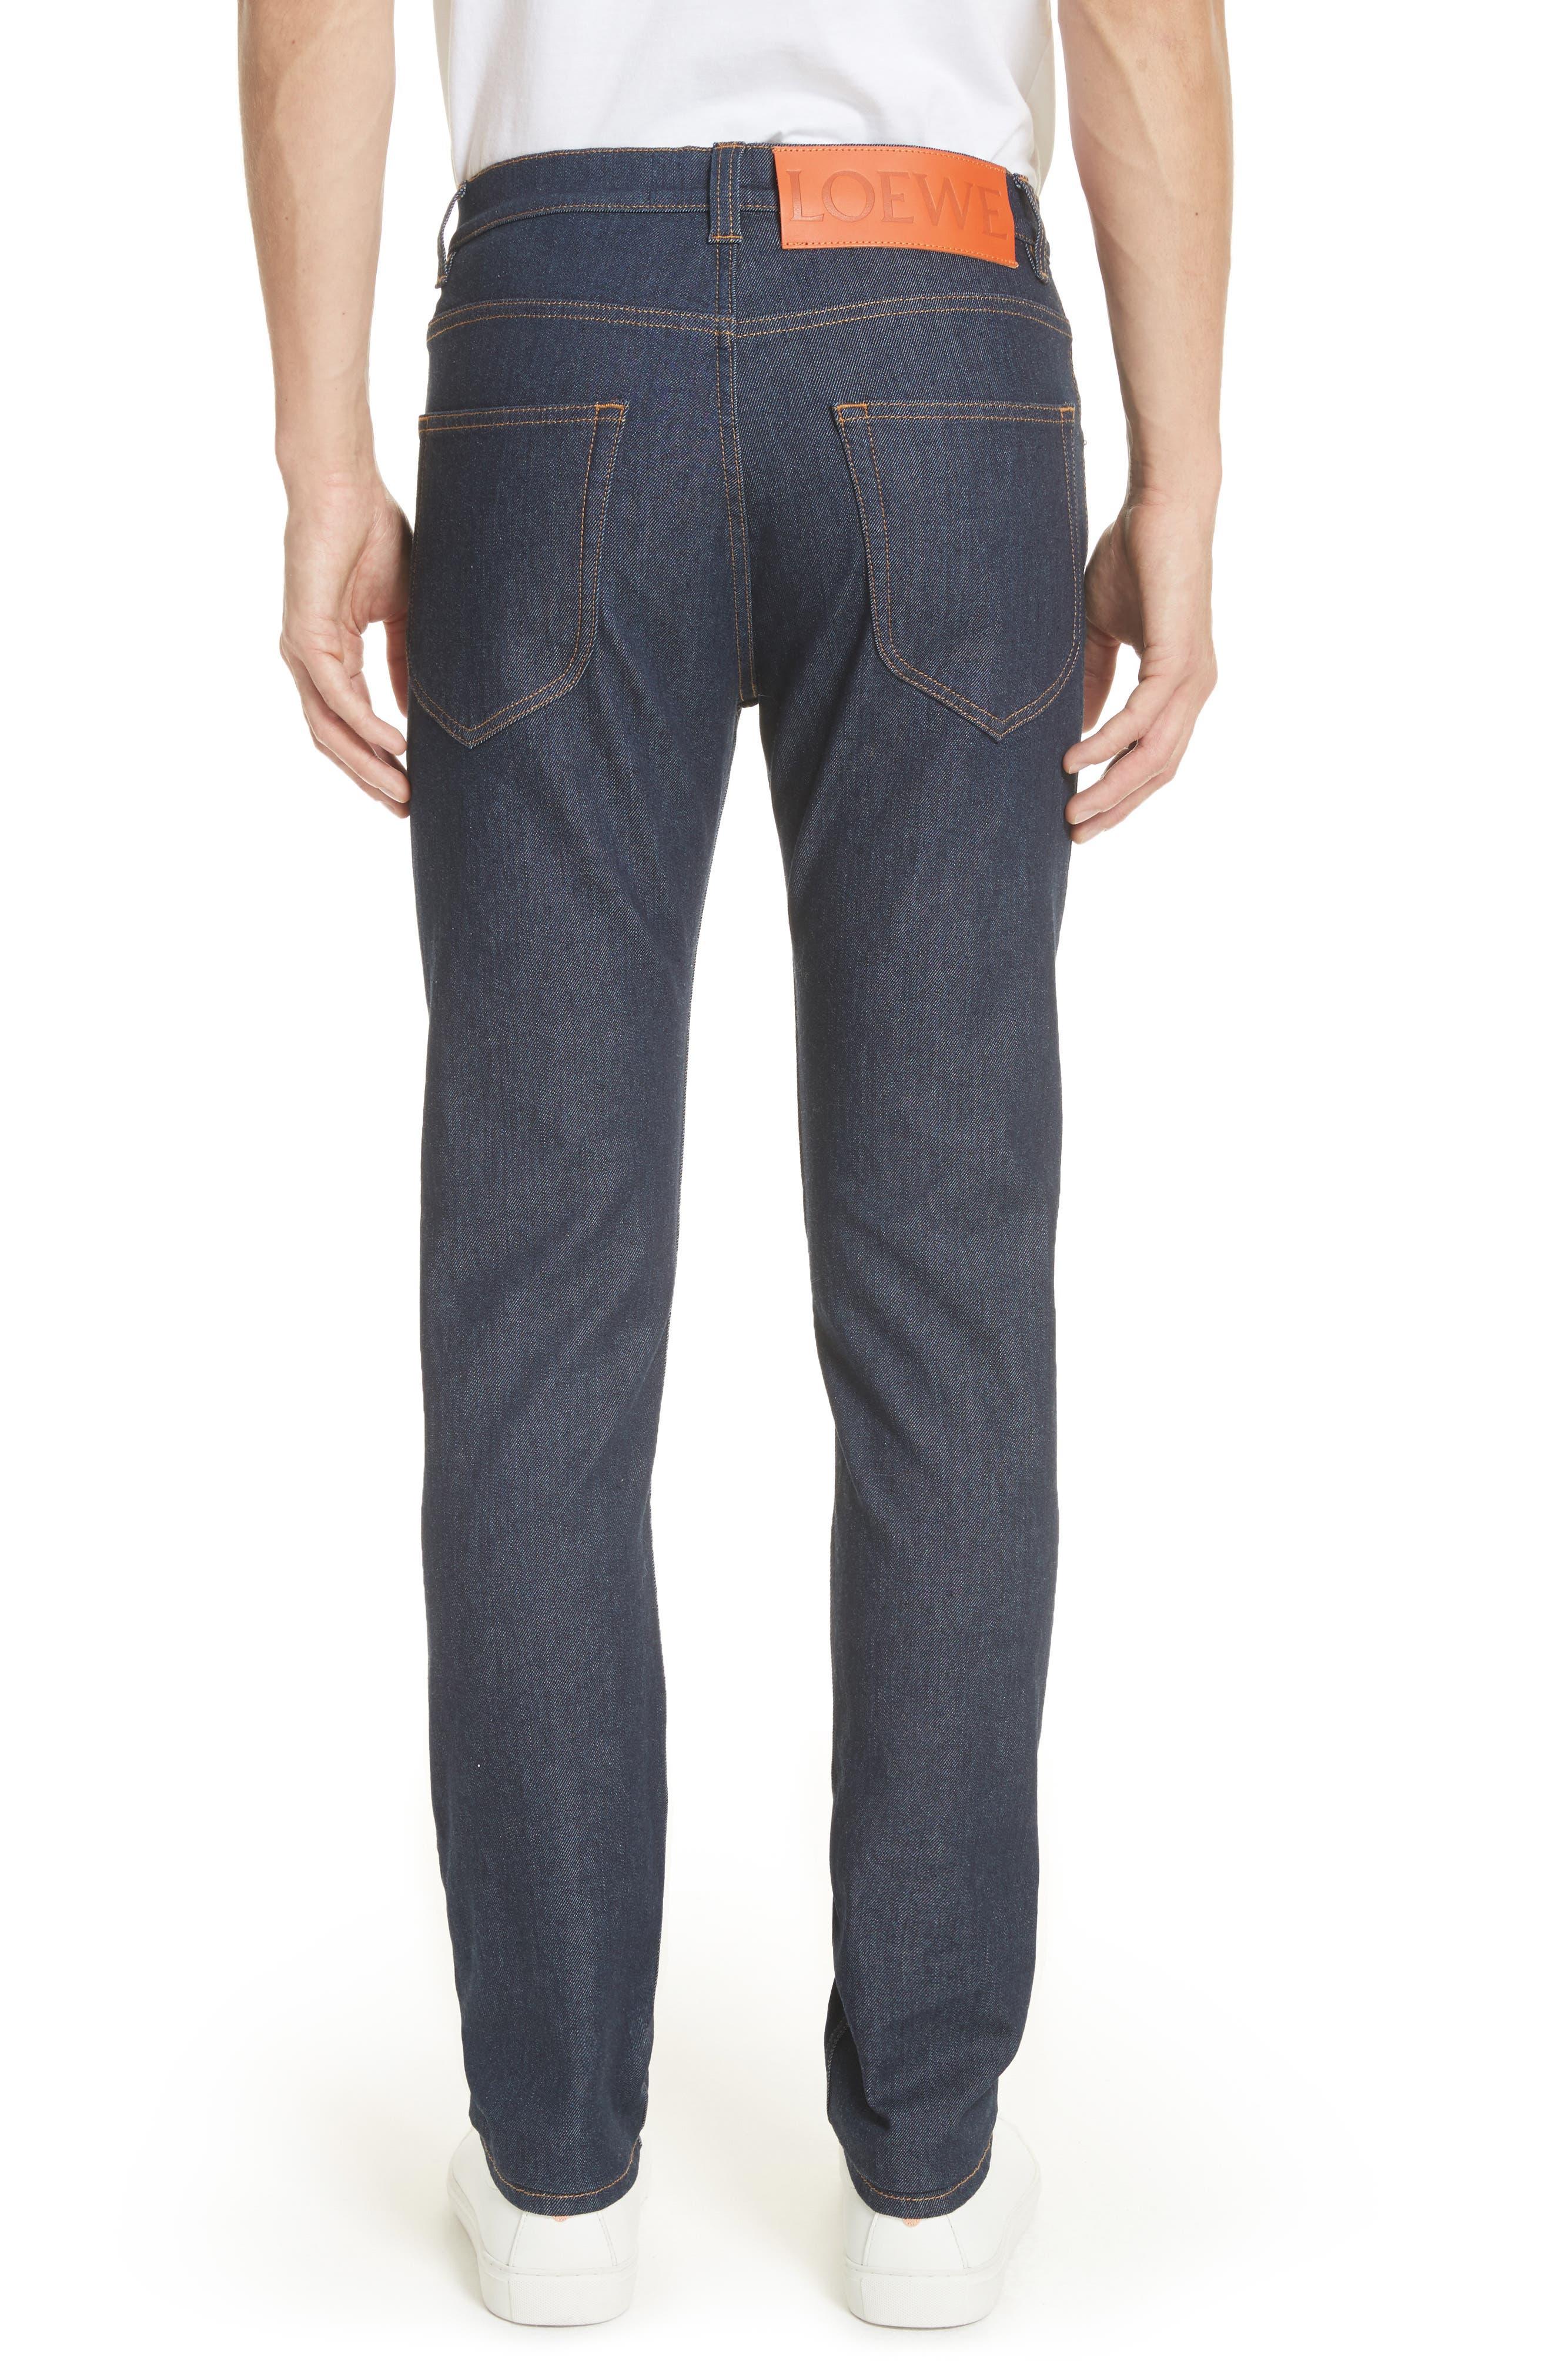 LOEWE, Skinny Fit Jeans, Alternate thumbnail 2, color, BLUE DENIM